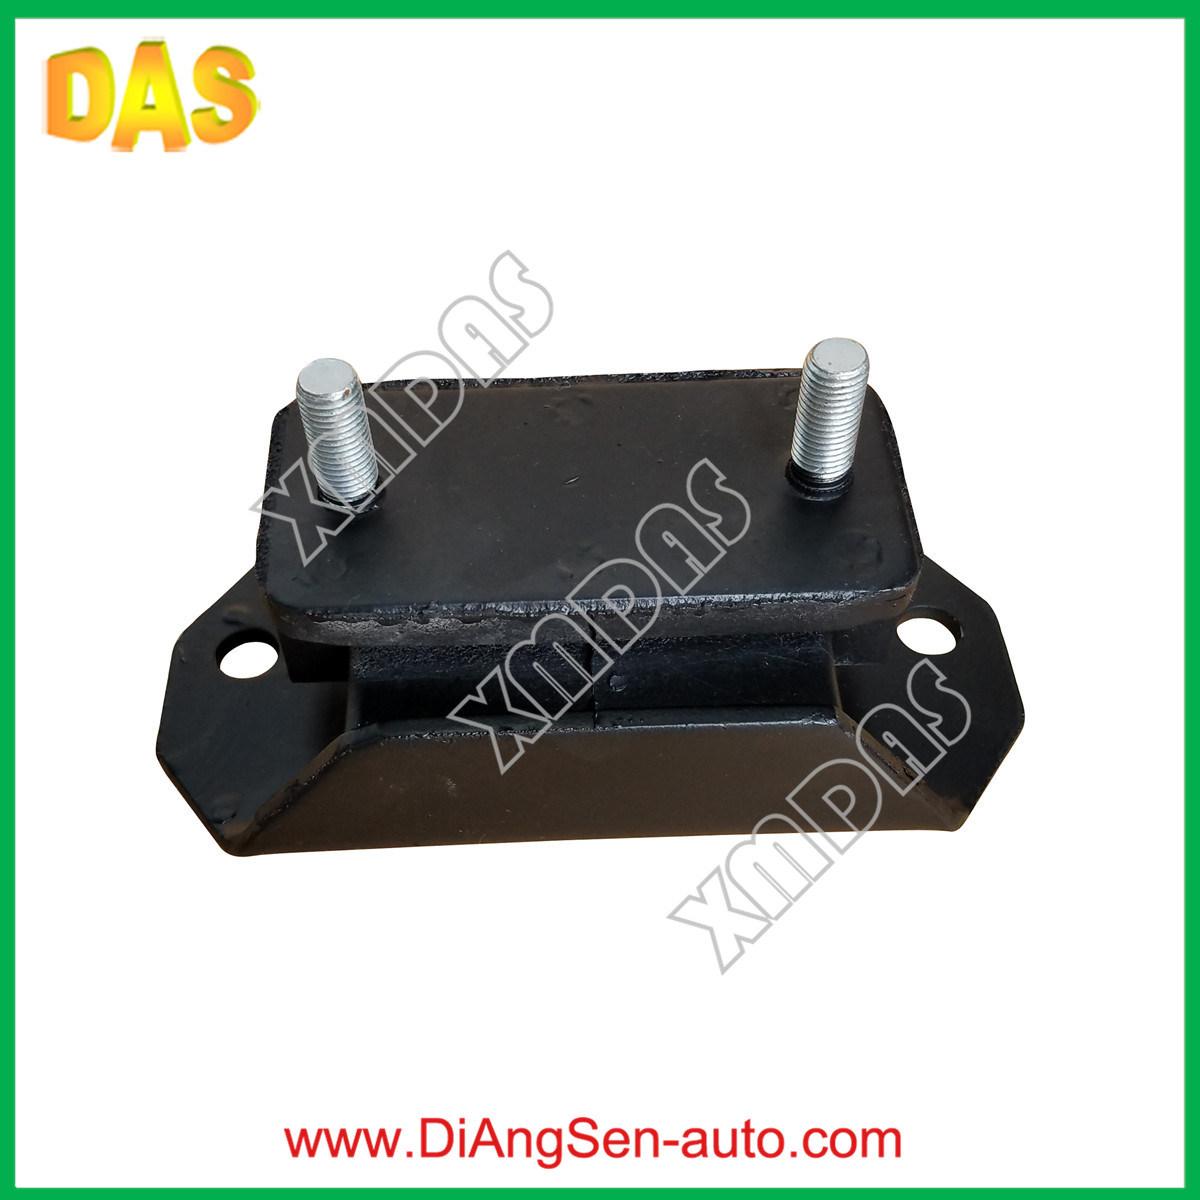 China 8 94434 208 1 Oem Manufacturer Transmission Engine Mount For 2009 Honda Ridgeline Suspension Control Arm Front Right Lower W0133 Isuzu Chasis Parts